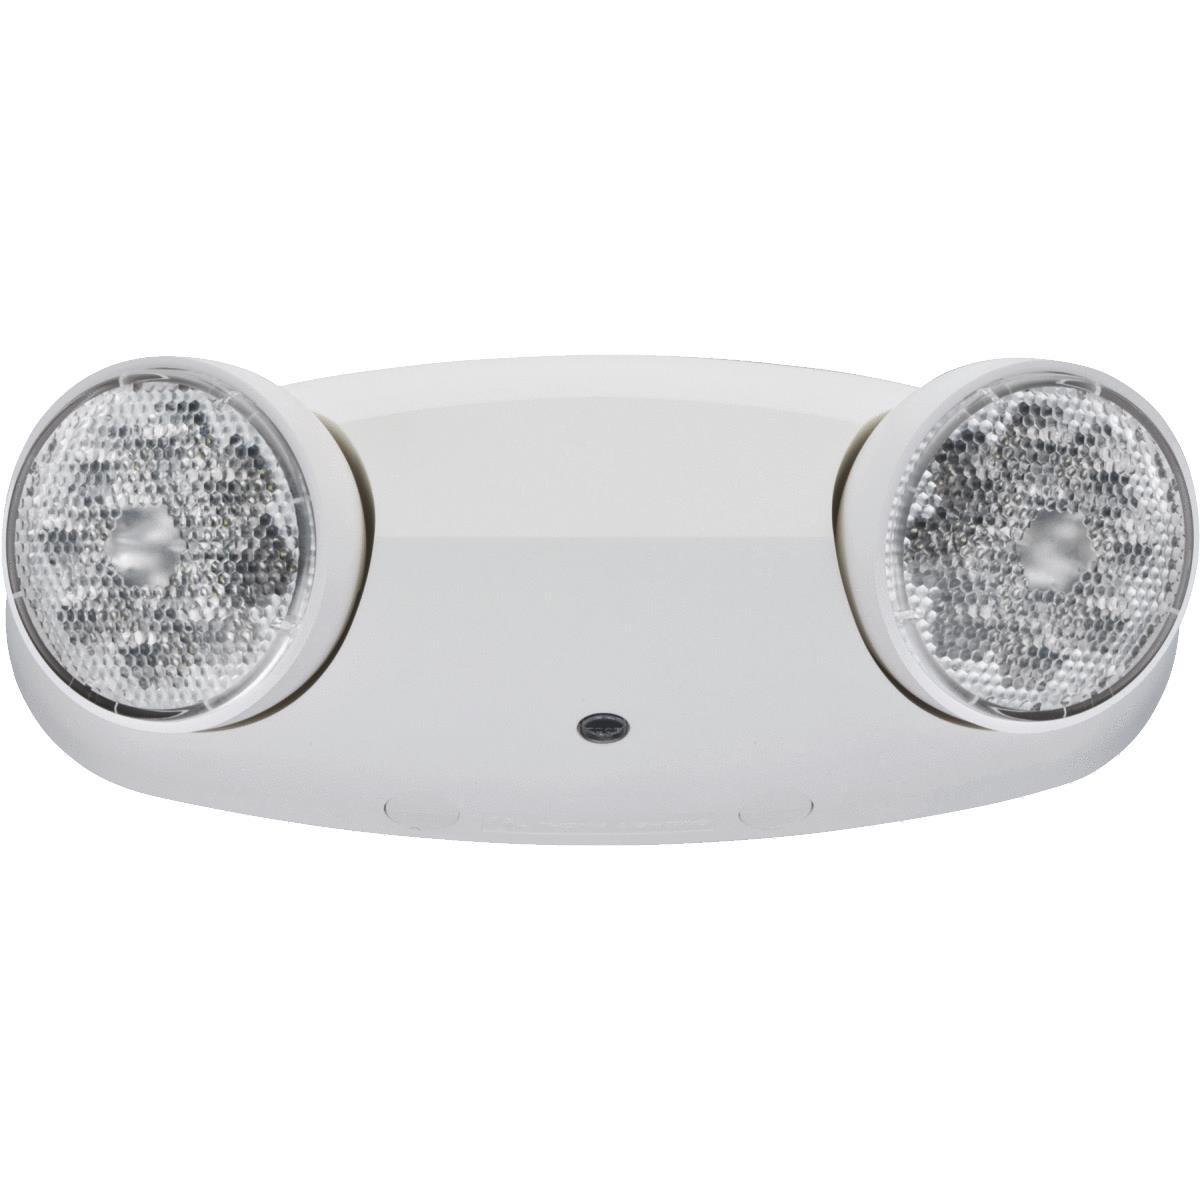 Led Light Fittings Argos: Buy Lithonia Quantum LED Emergency Light White